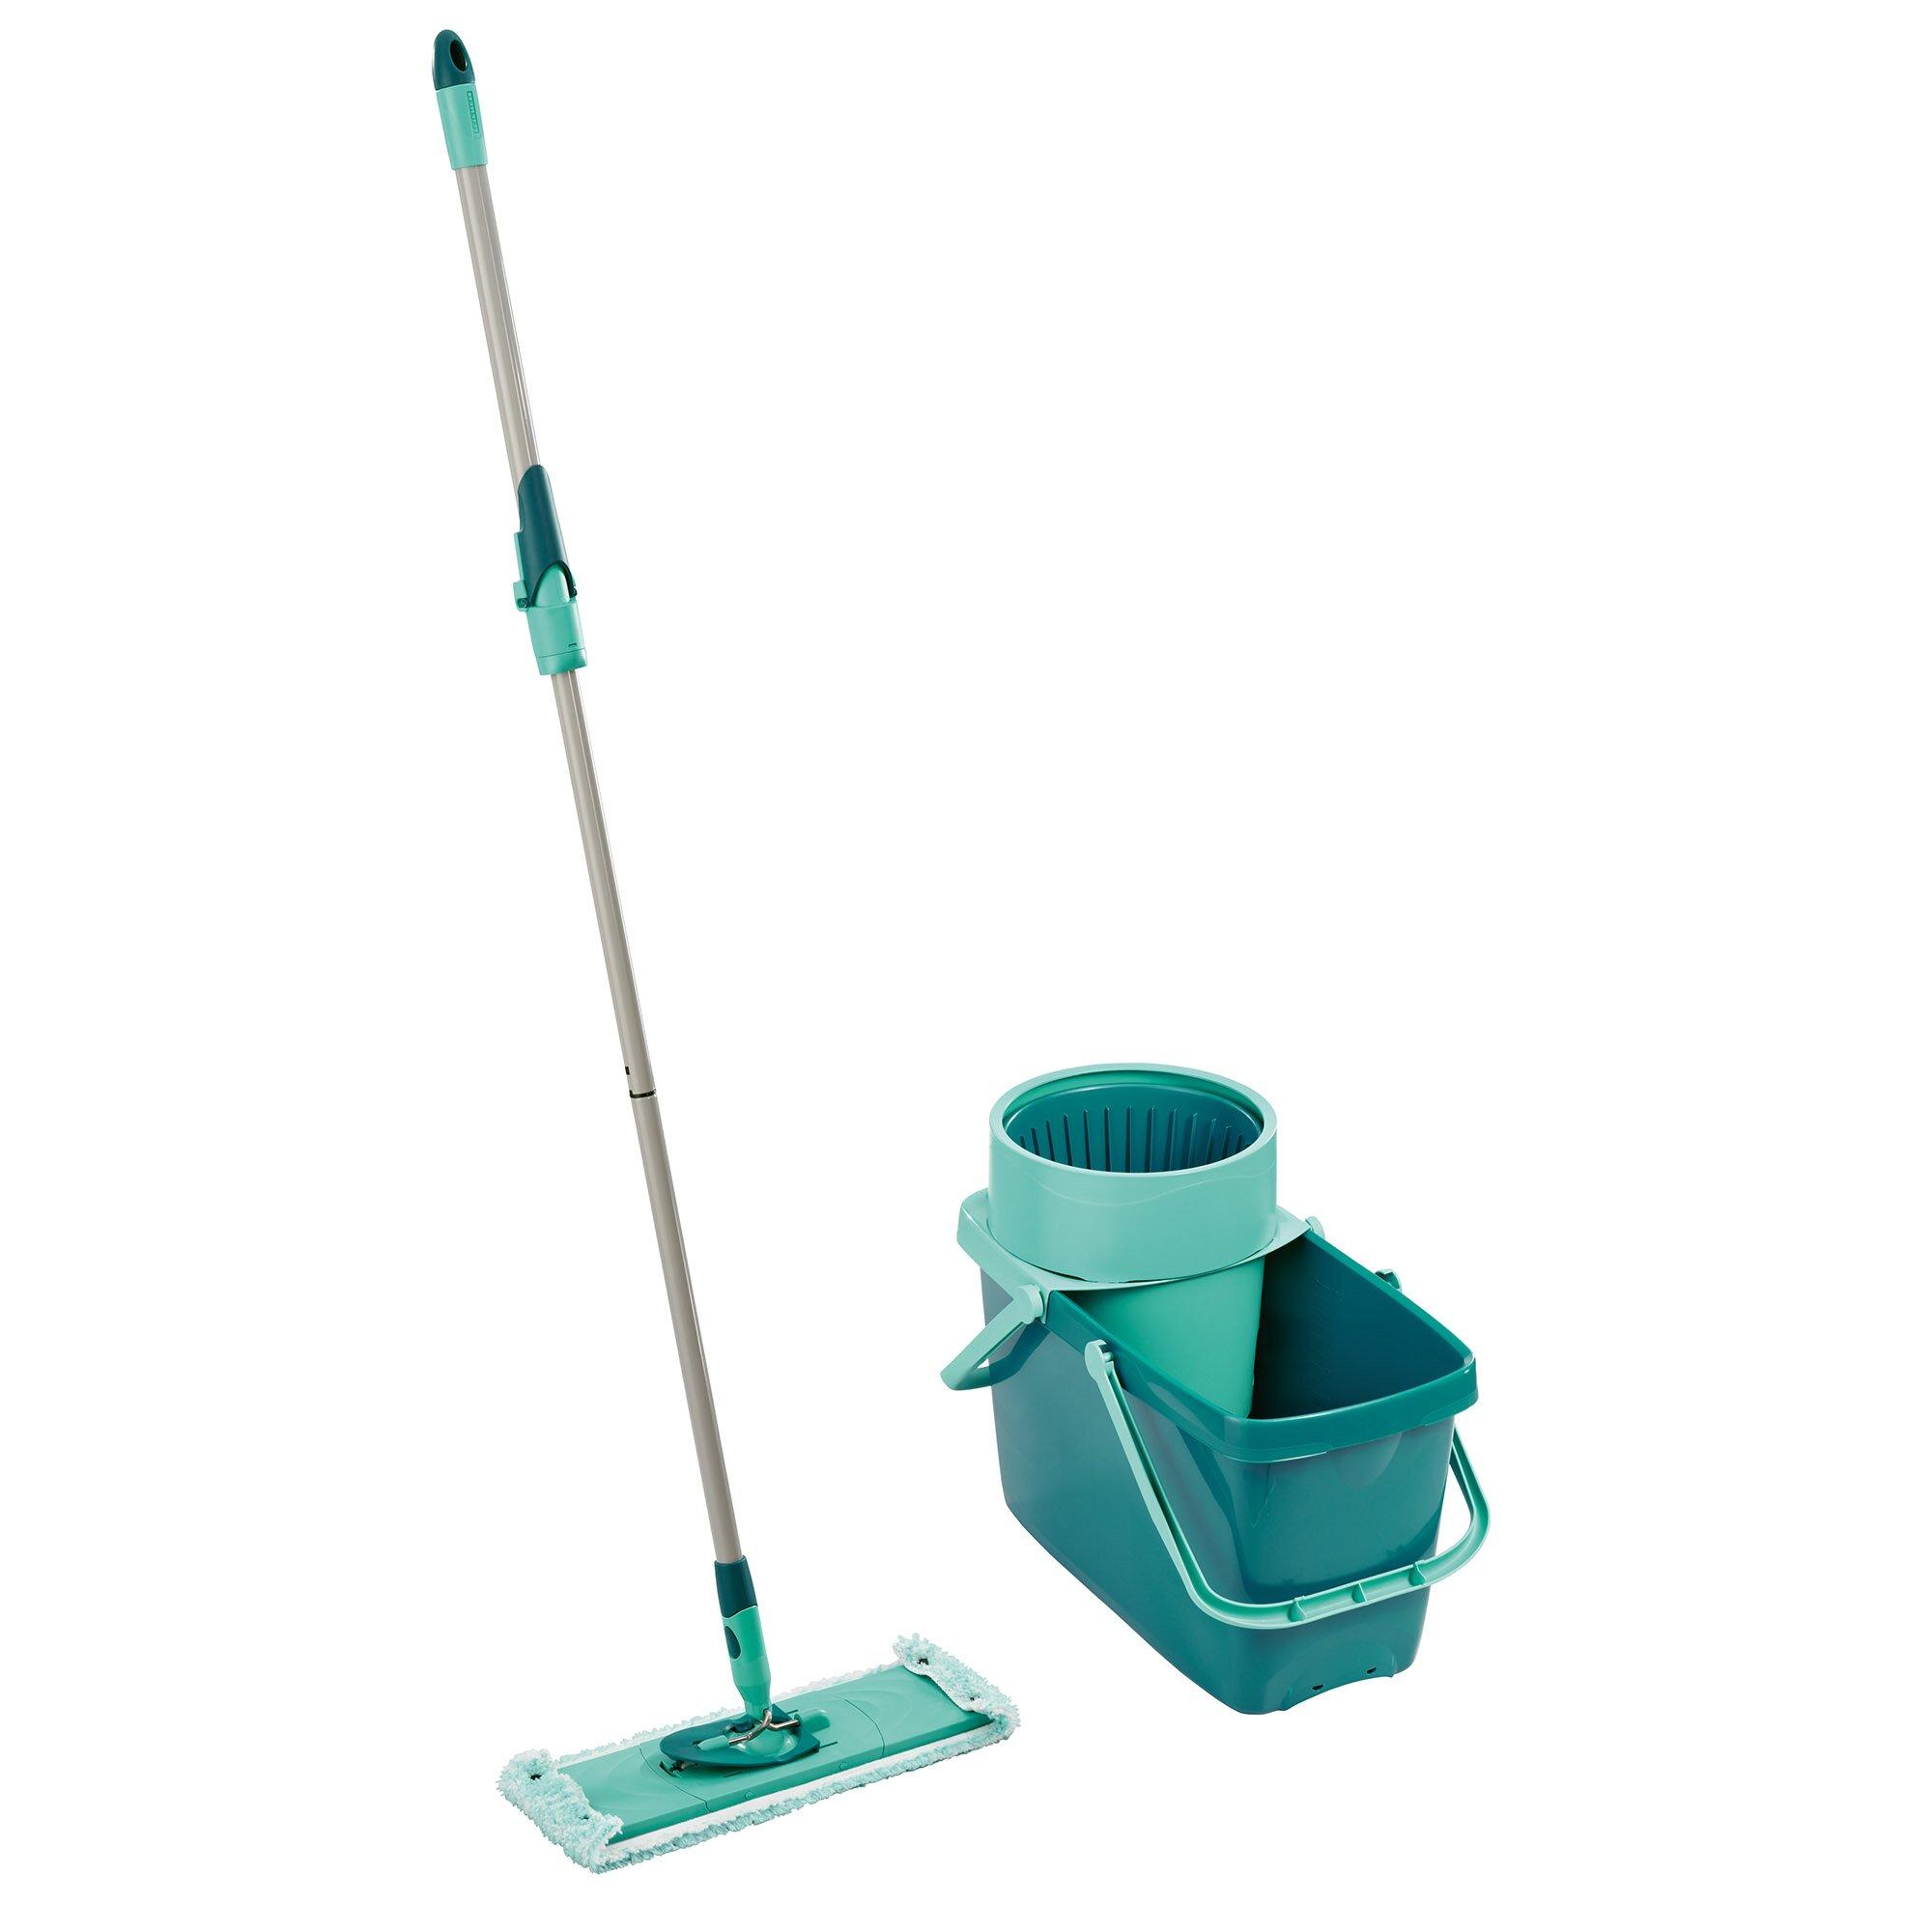 clean twist xl rectangular mop sweeper set with mop and spin bucket wayfair. Black Bedroom Furniture Sets. Home Design Ideas